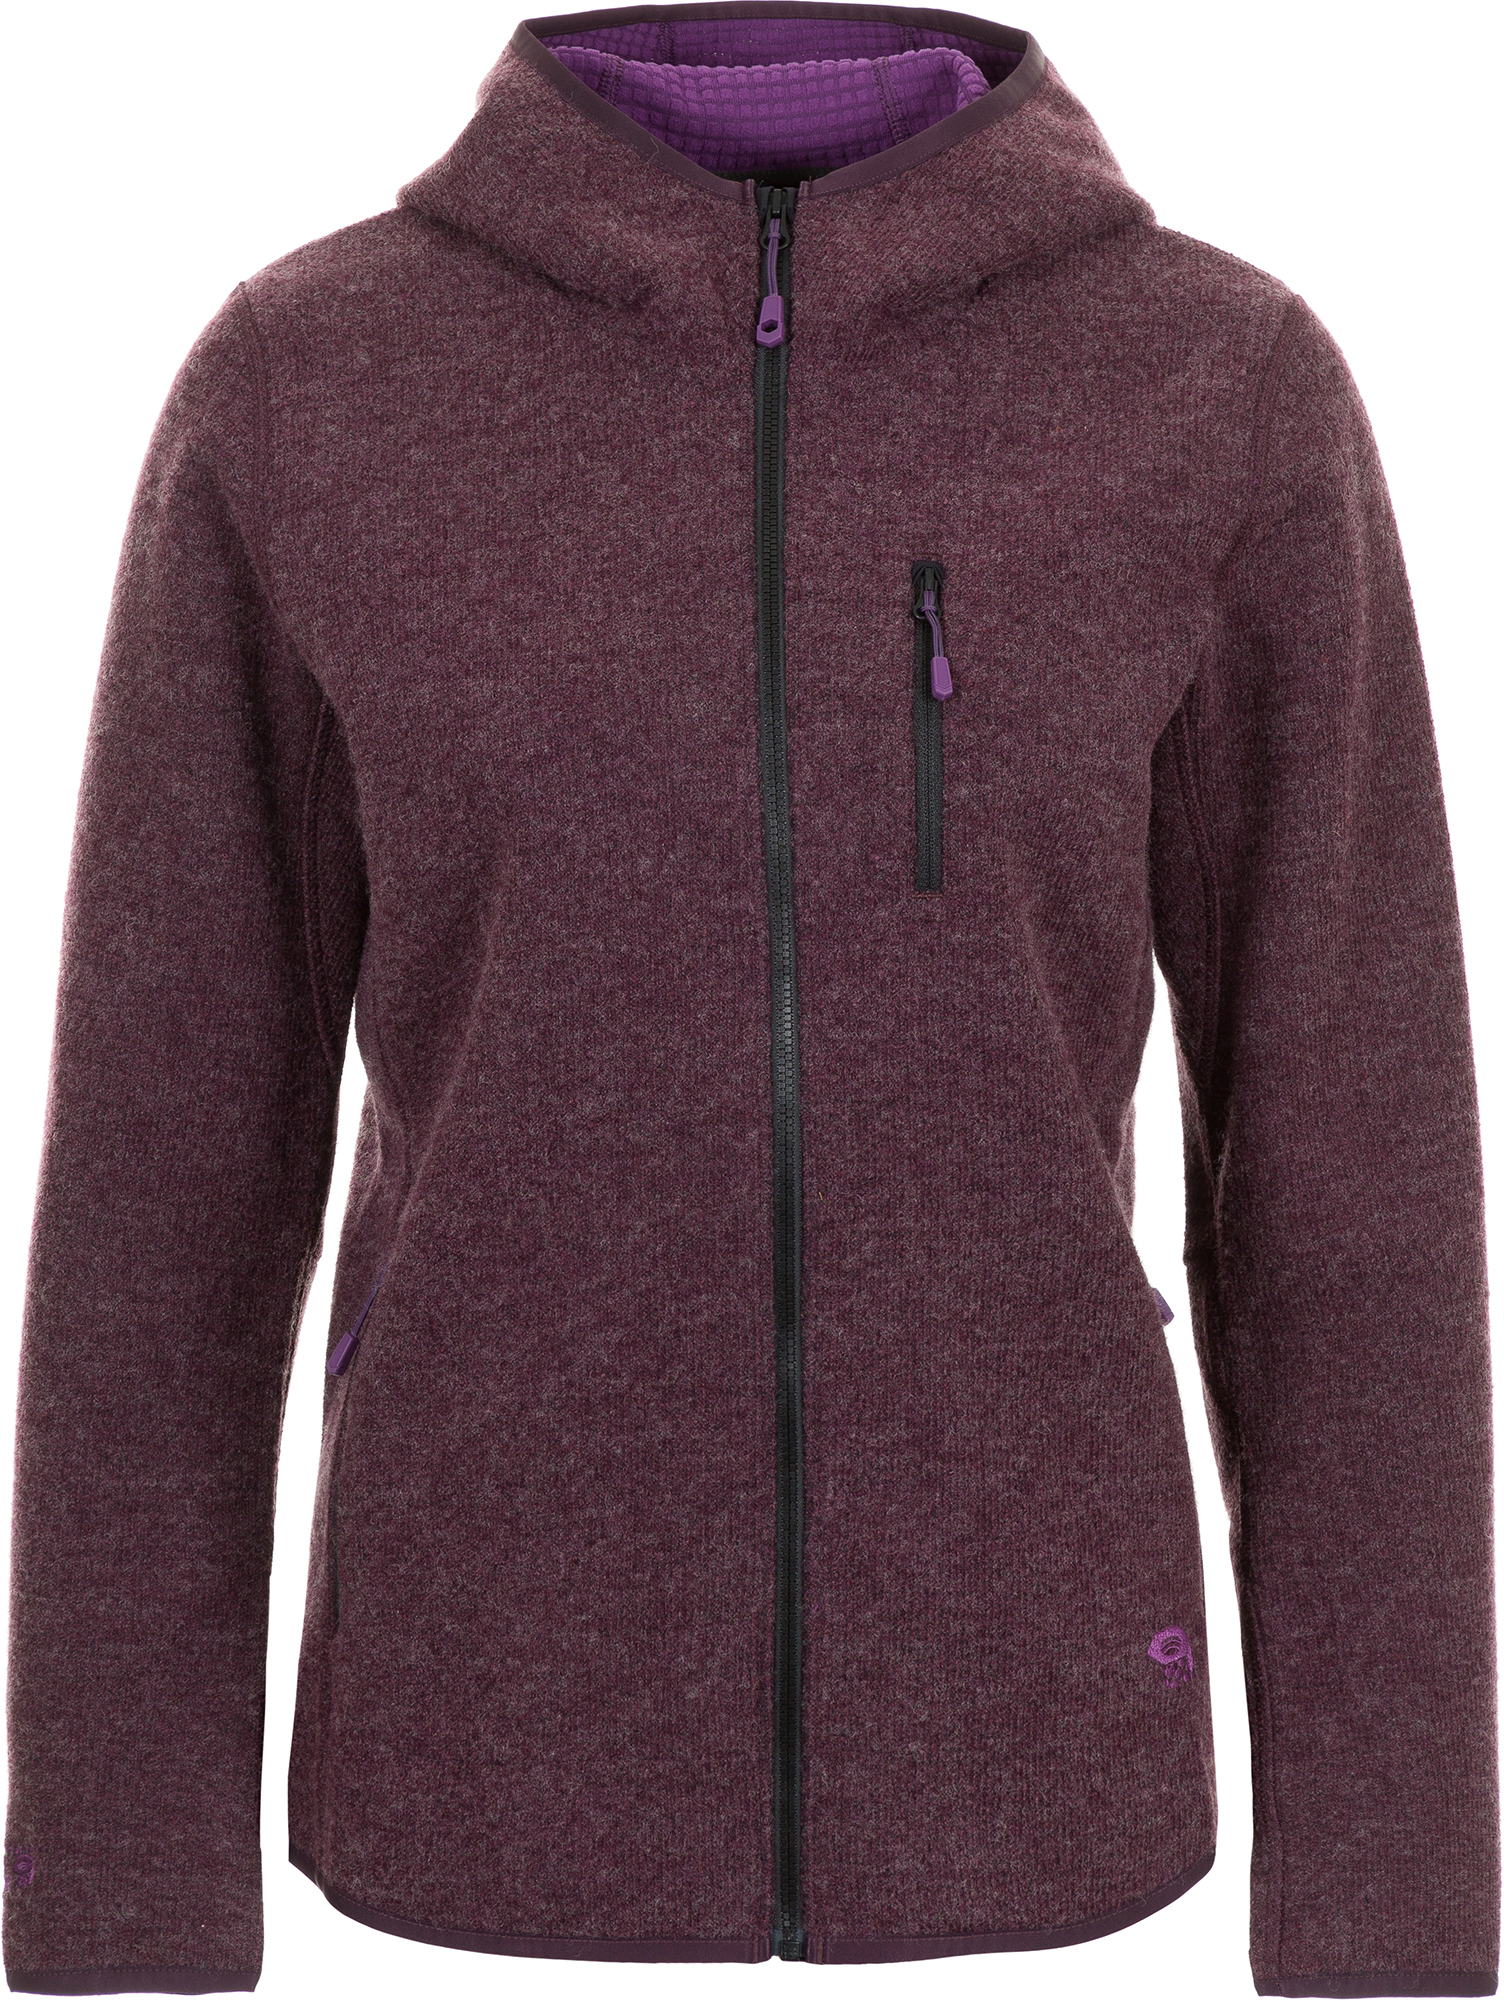 Mountain Hardwear Джемпер женский Mountain Hardwear Hatcher, размер 46 цена в Москве и Питере